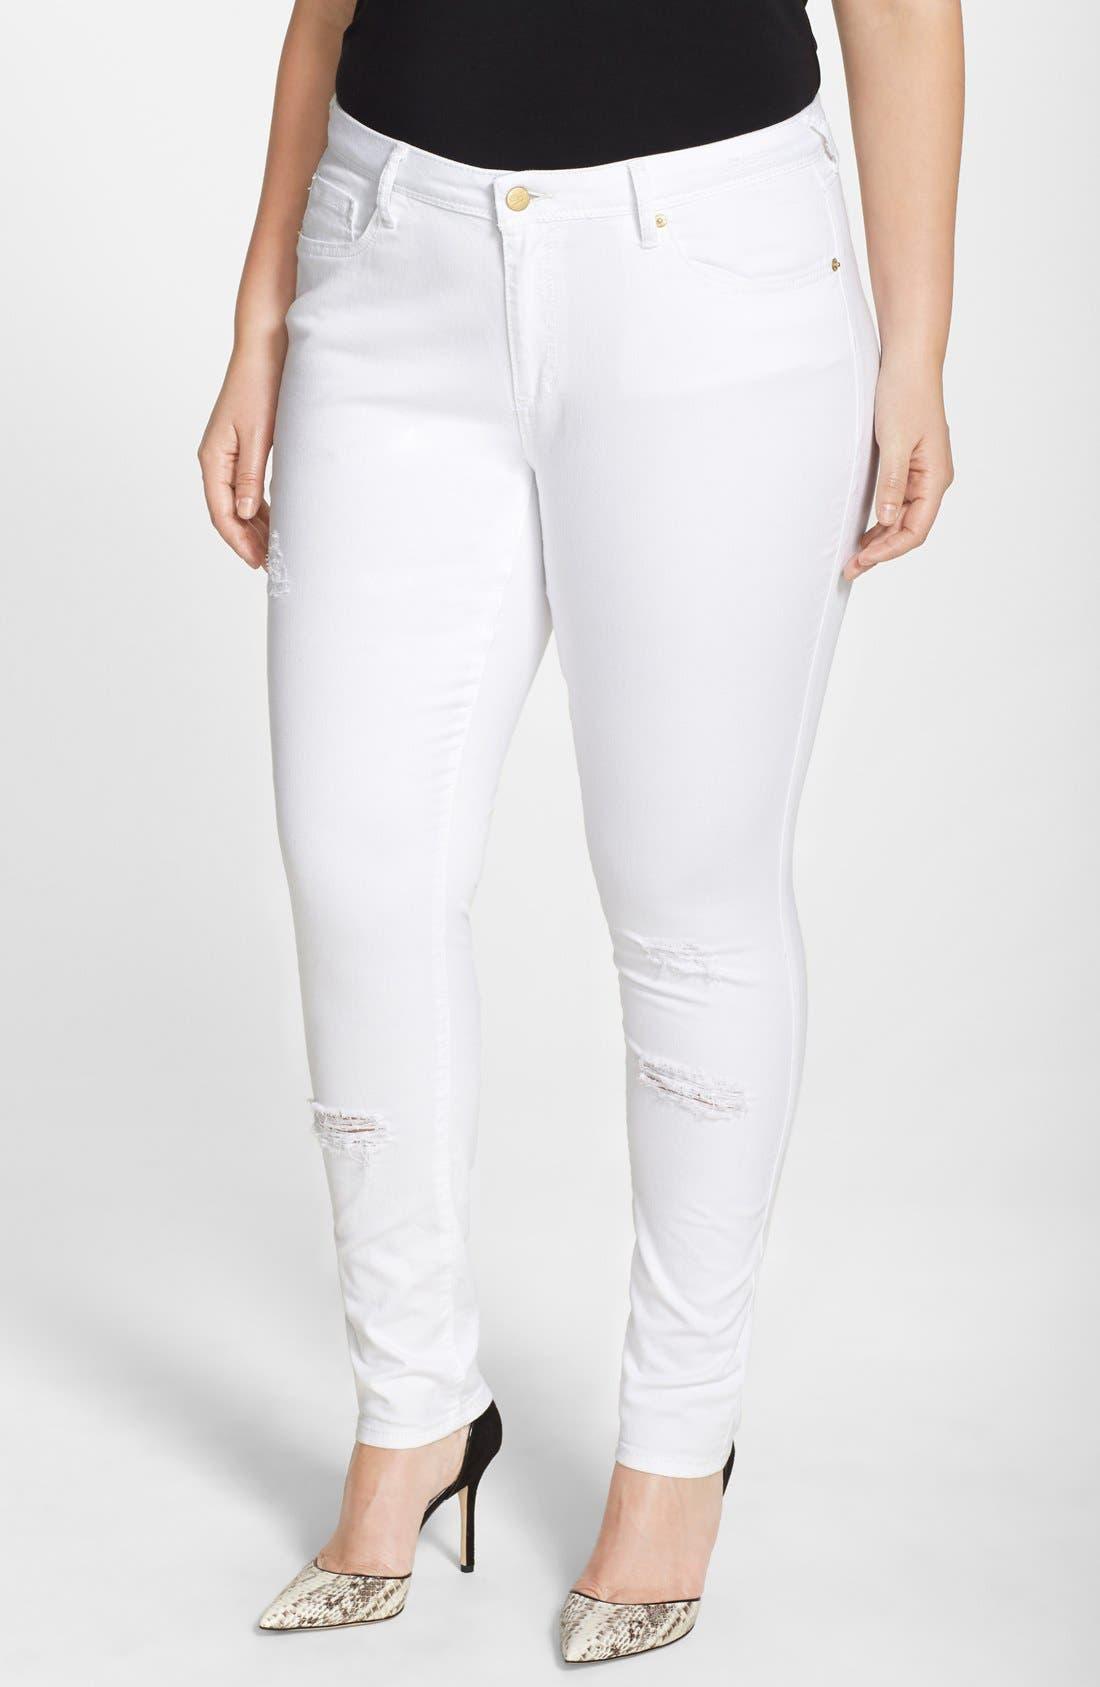 POETIC JUSTICE 'Maya' Destroyed White Skinny Jeans, Main, color, CASPER